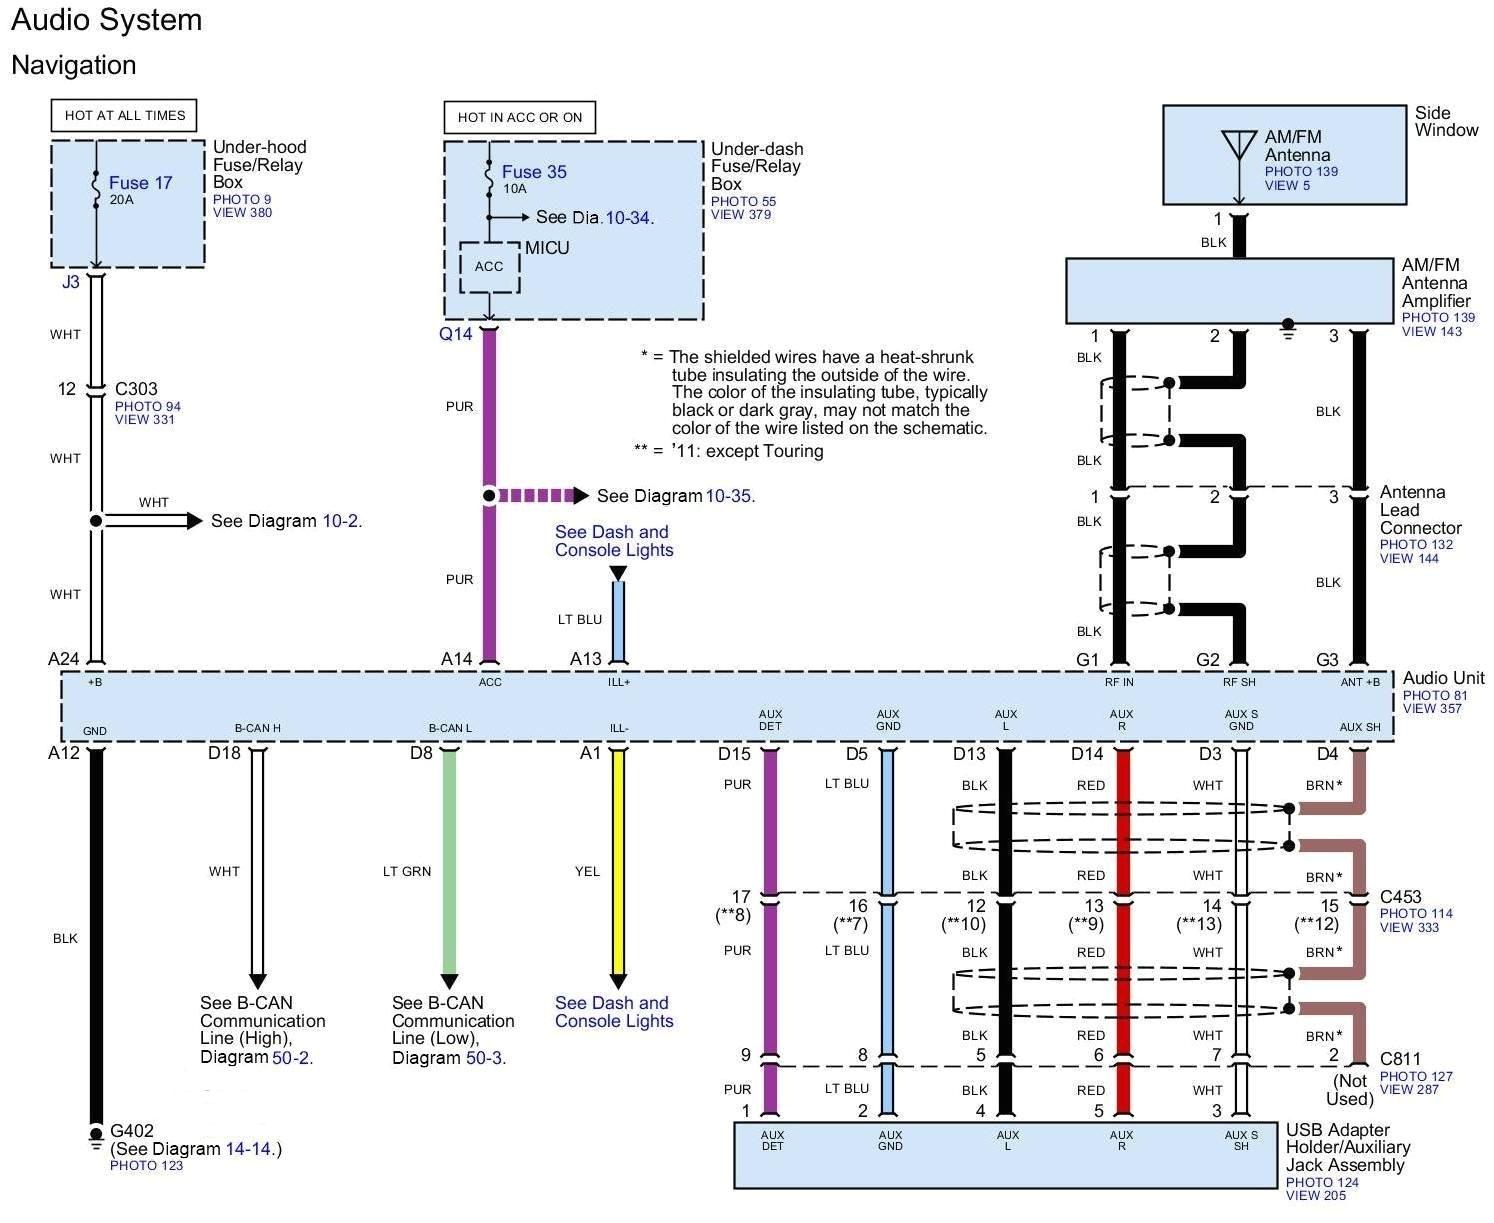 2009 honda civic stereo wiring diagram 09 honda cr v wiring diagram wiring diagram schematic diagram of honda civic 2010 07 09 13b at honda wiring diagrams jpg